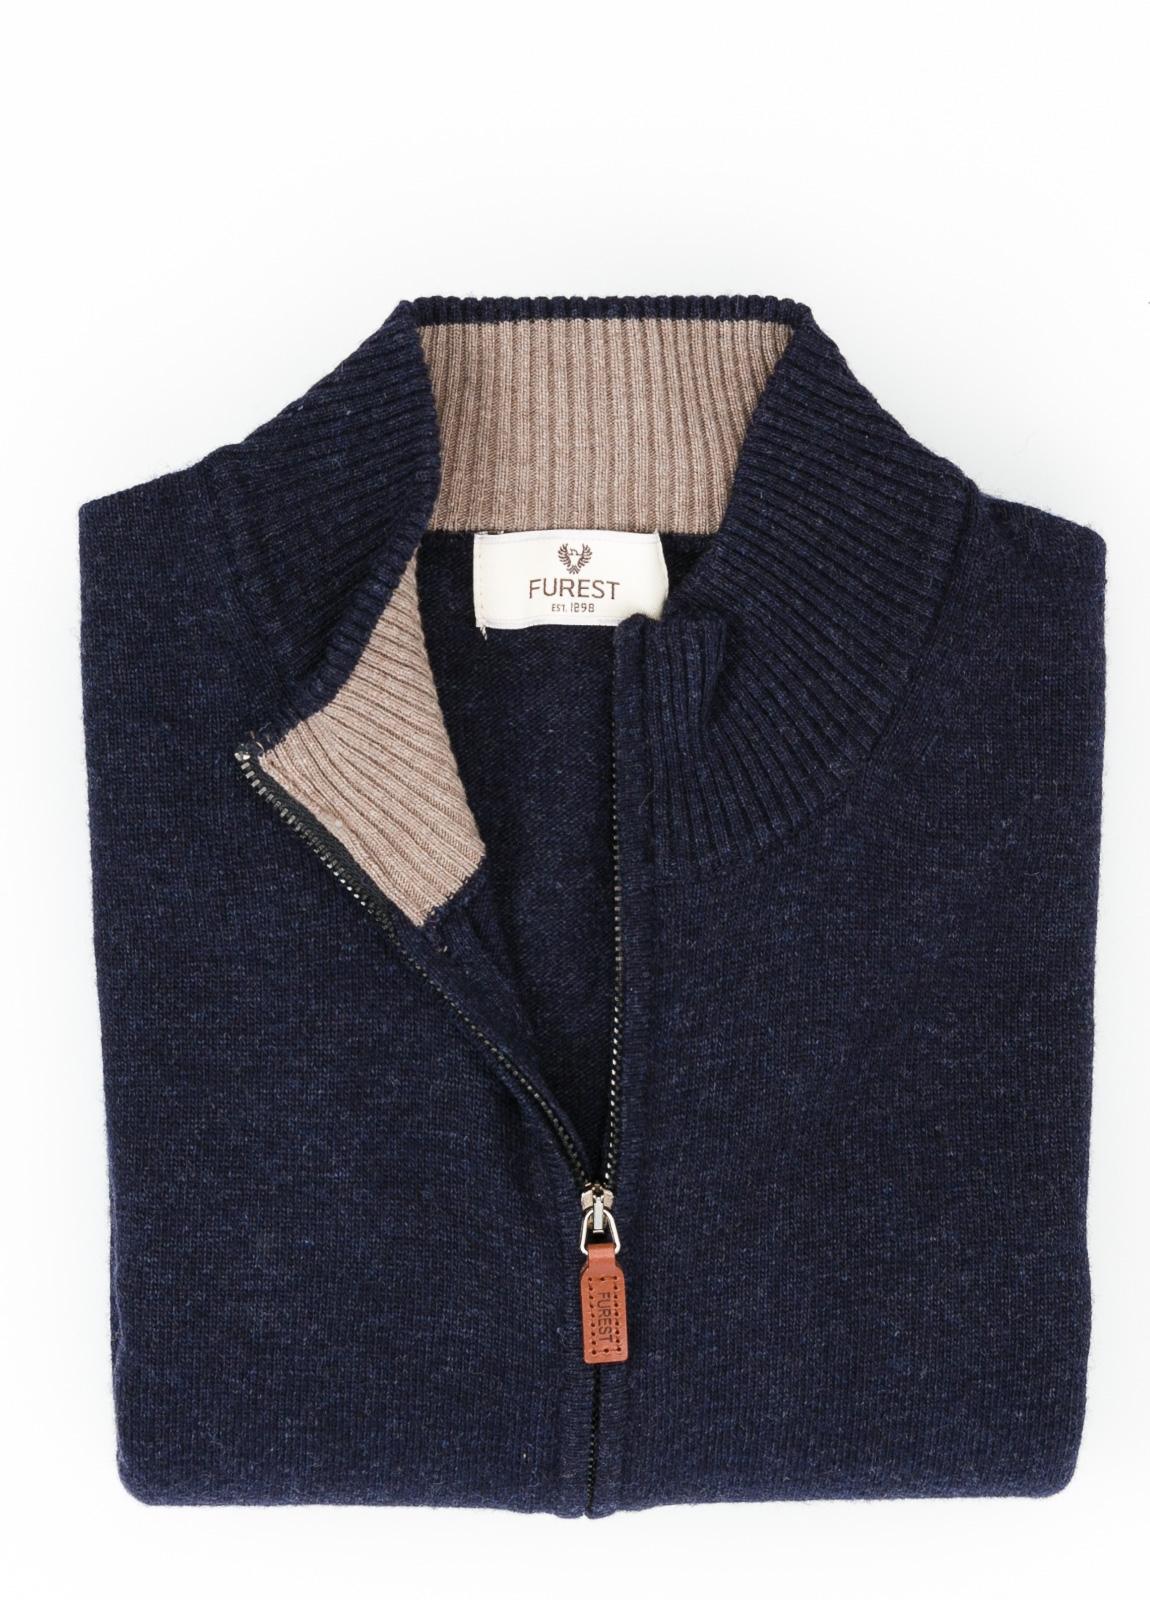 Jersey liso cremallera doble carro, color azul marino, 40% lana merino, 30% viscosa, 10% cachemire - Ítem1